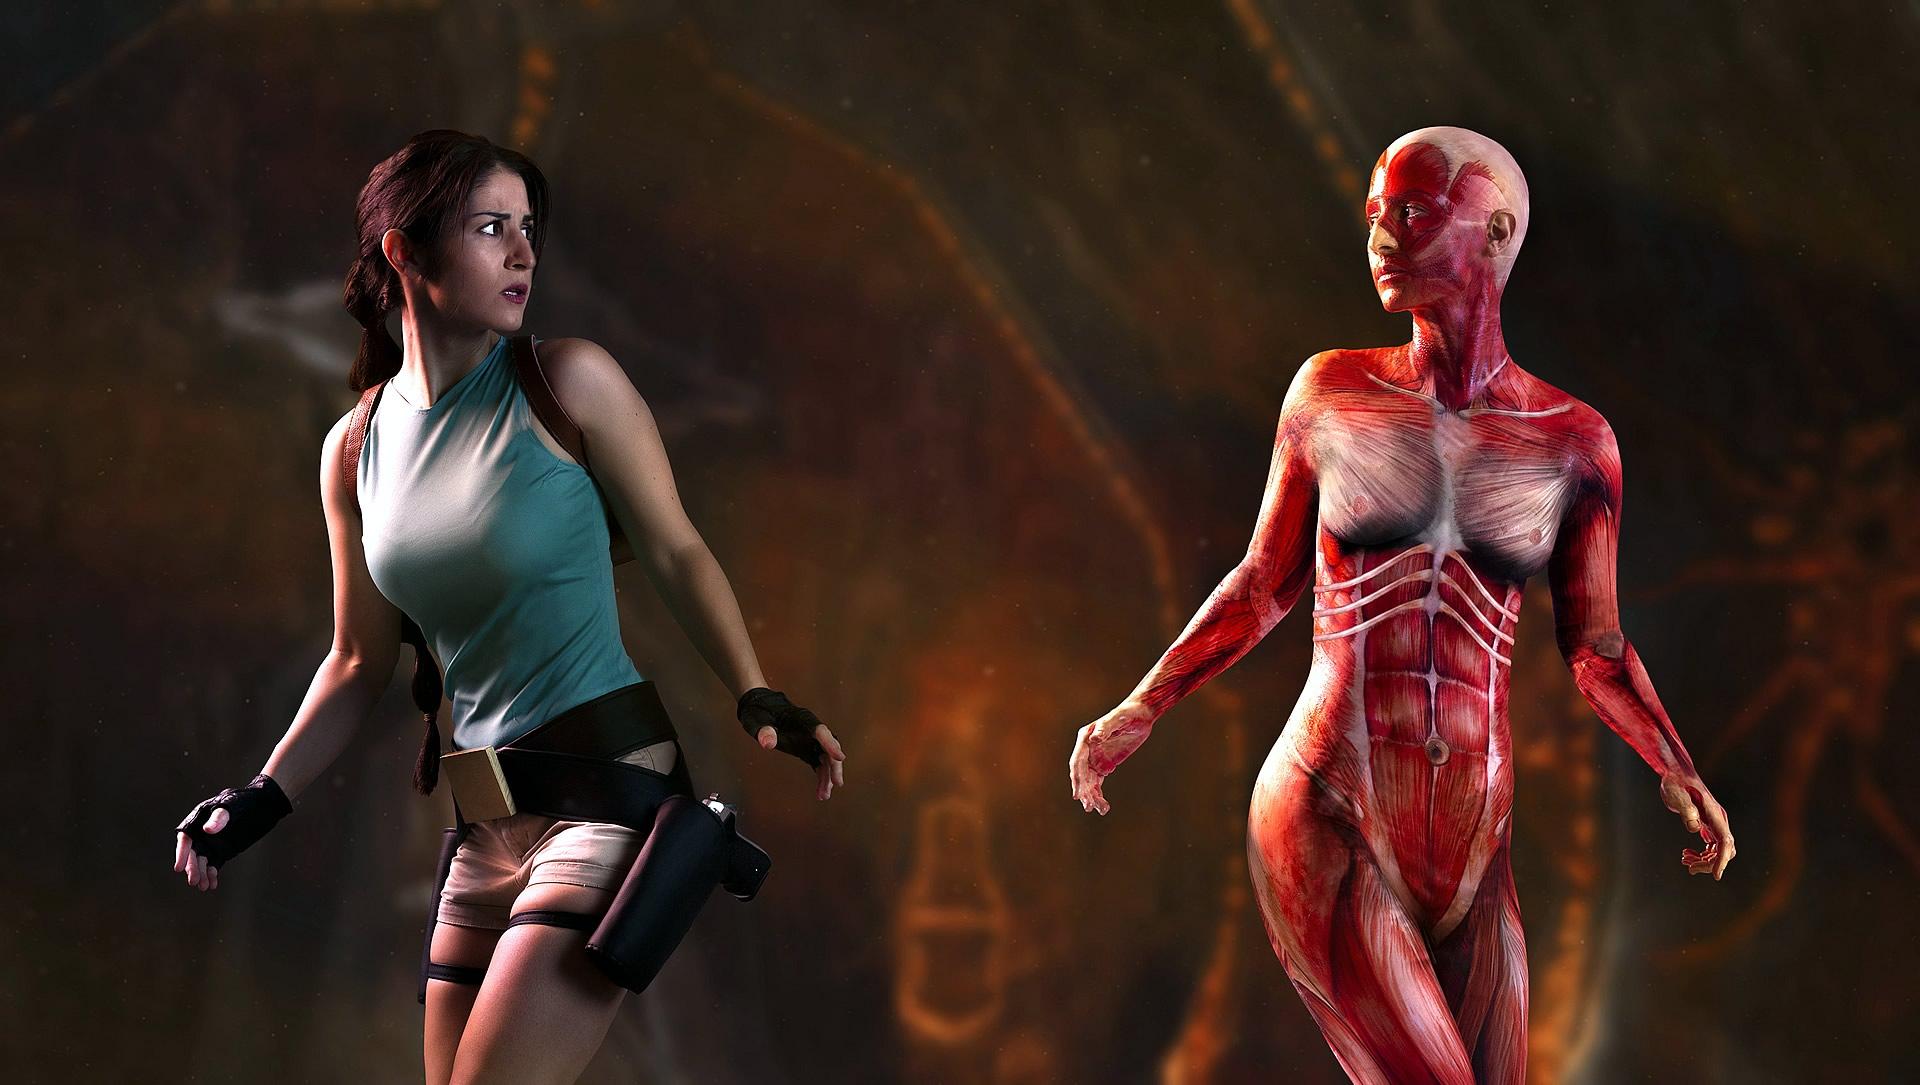 crofty model cosplayer tomb raider 1 e - Crofty - The Old School Lara Croft Cosplayer